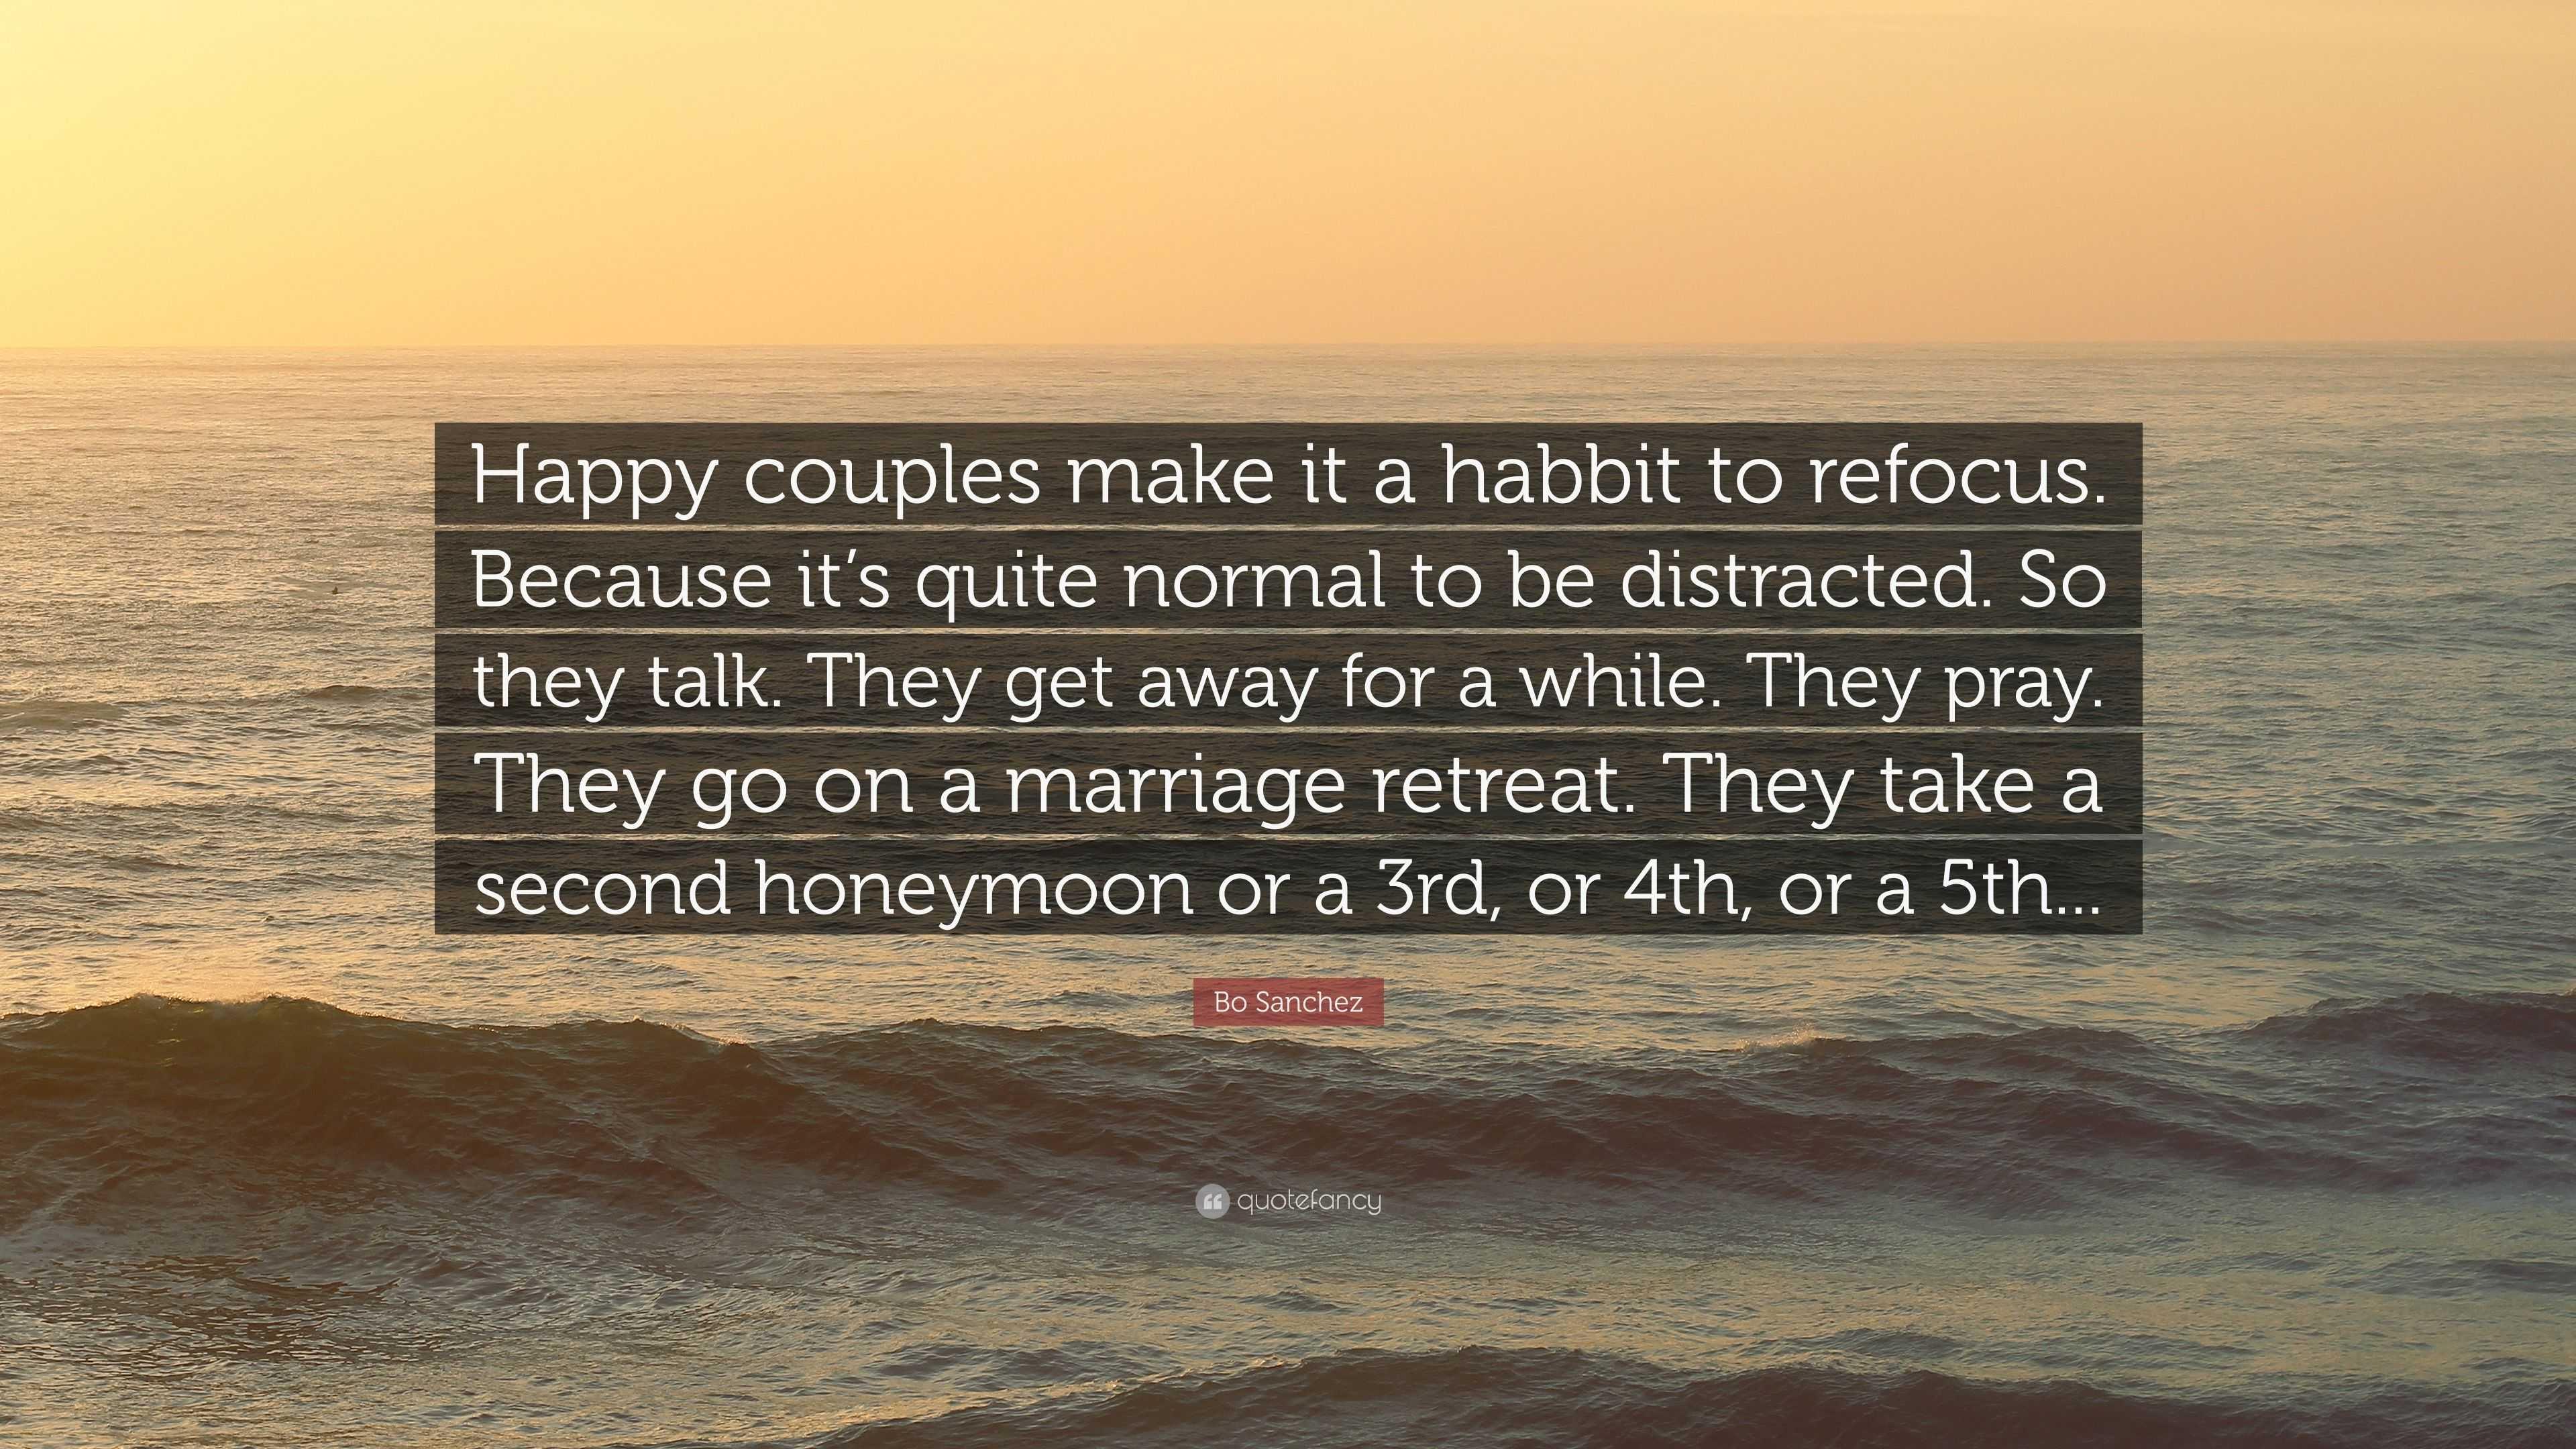 "bo sanchez quote ""happy couples make it a habbit to refocus"